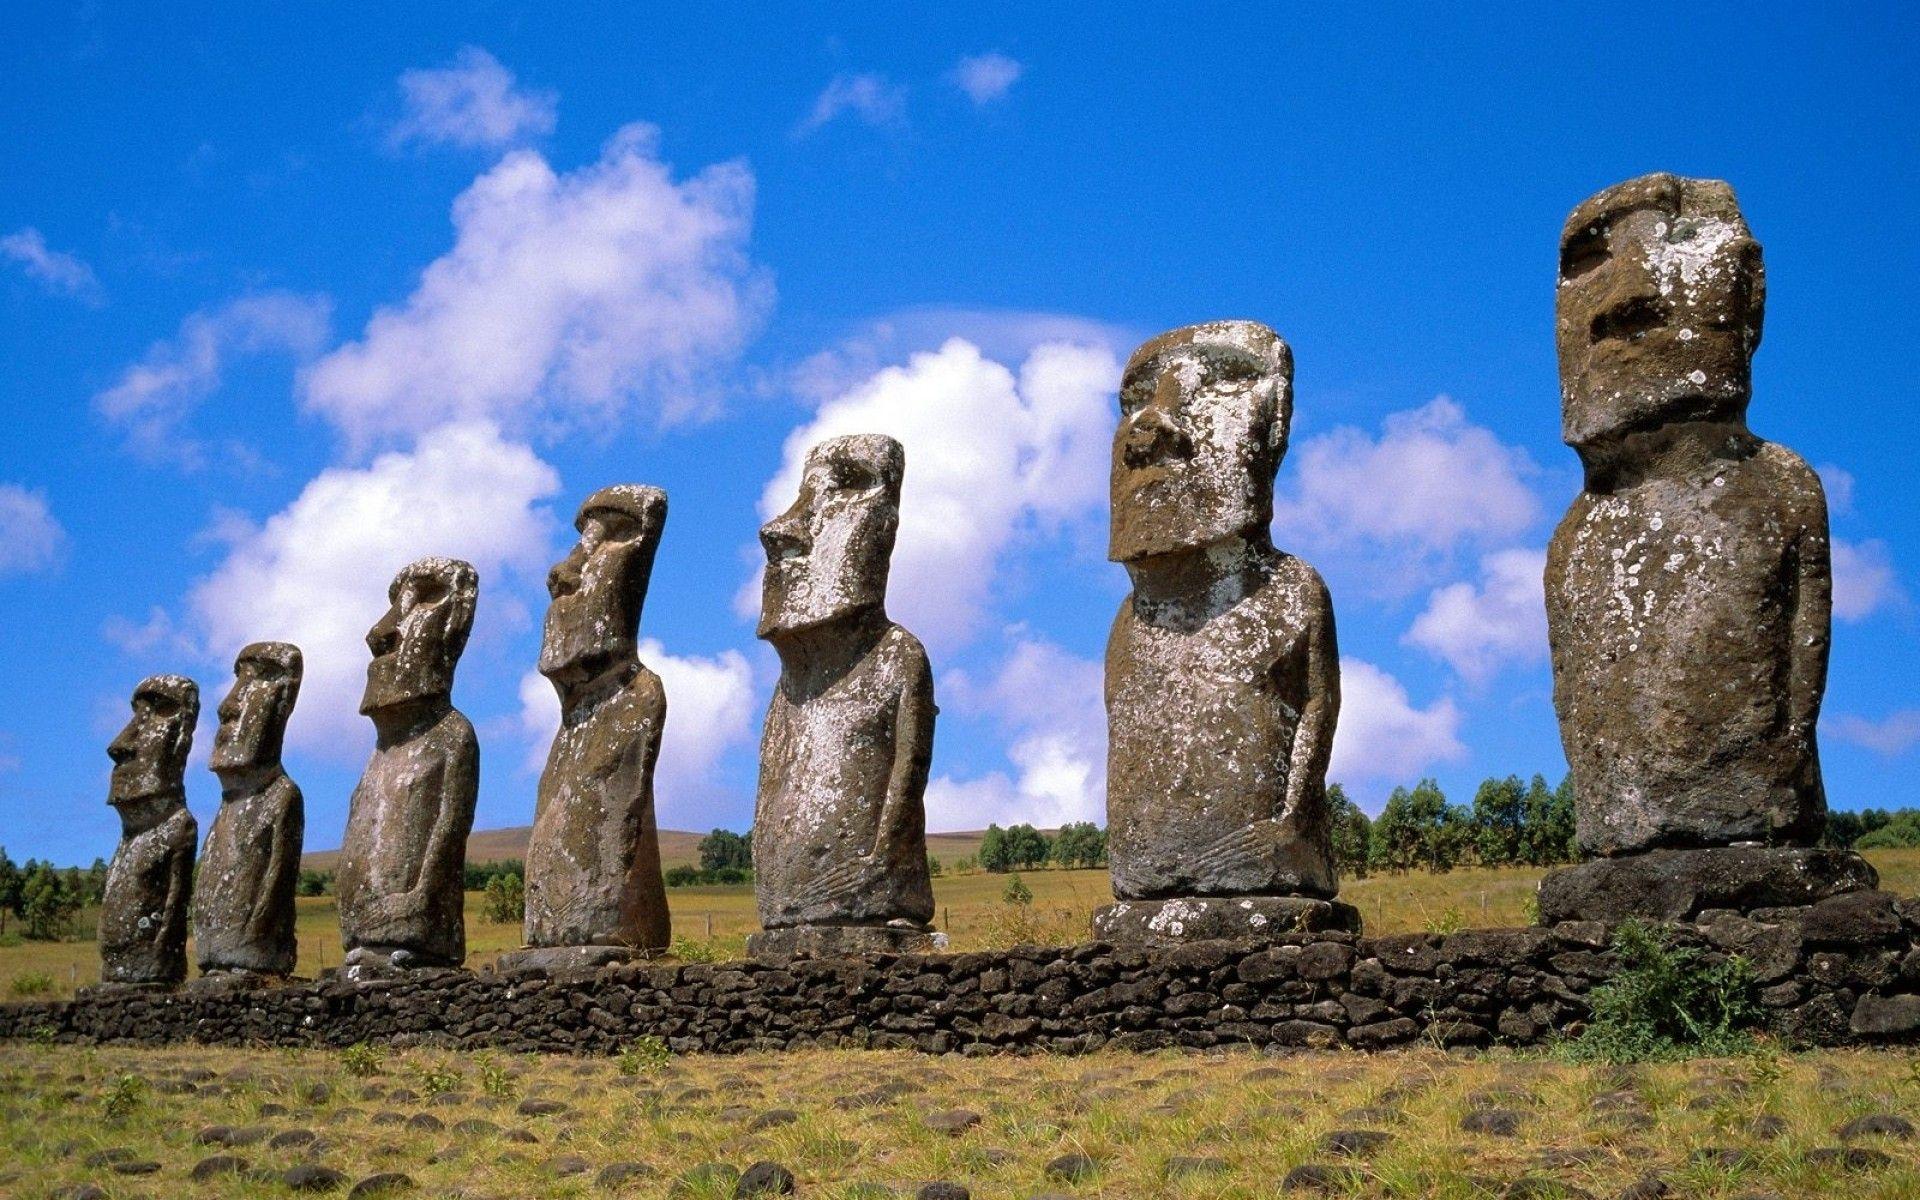 Hd wallpaper sites - Easter Island Widescreen Wallpaper 1920x1200